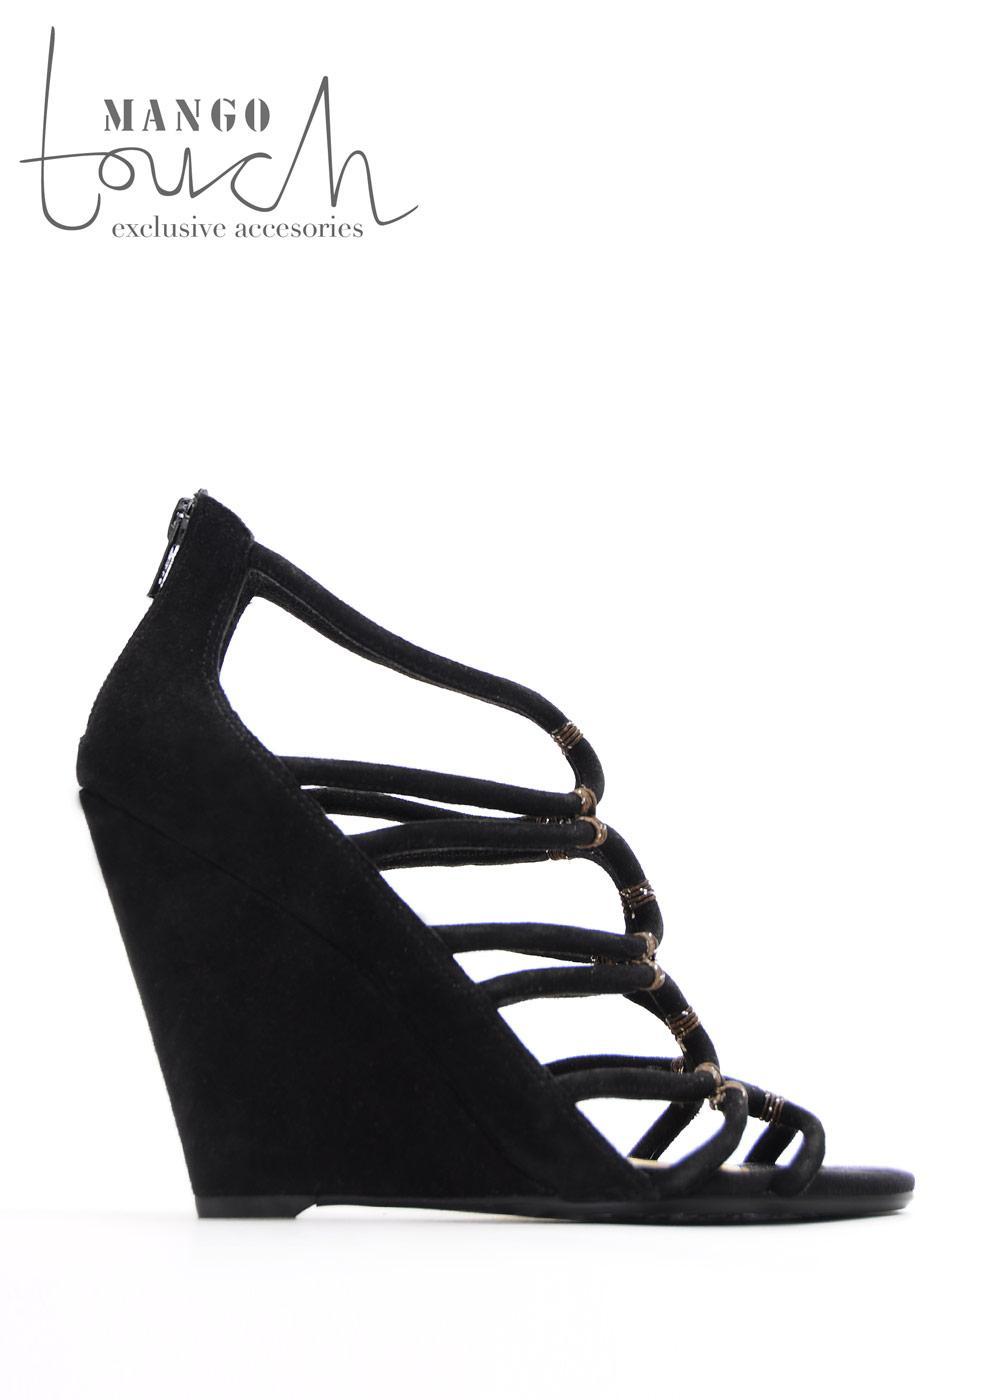 czarne sandały Mango - lato 2011